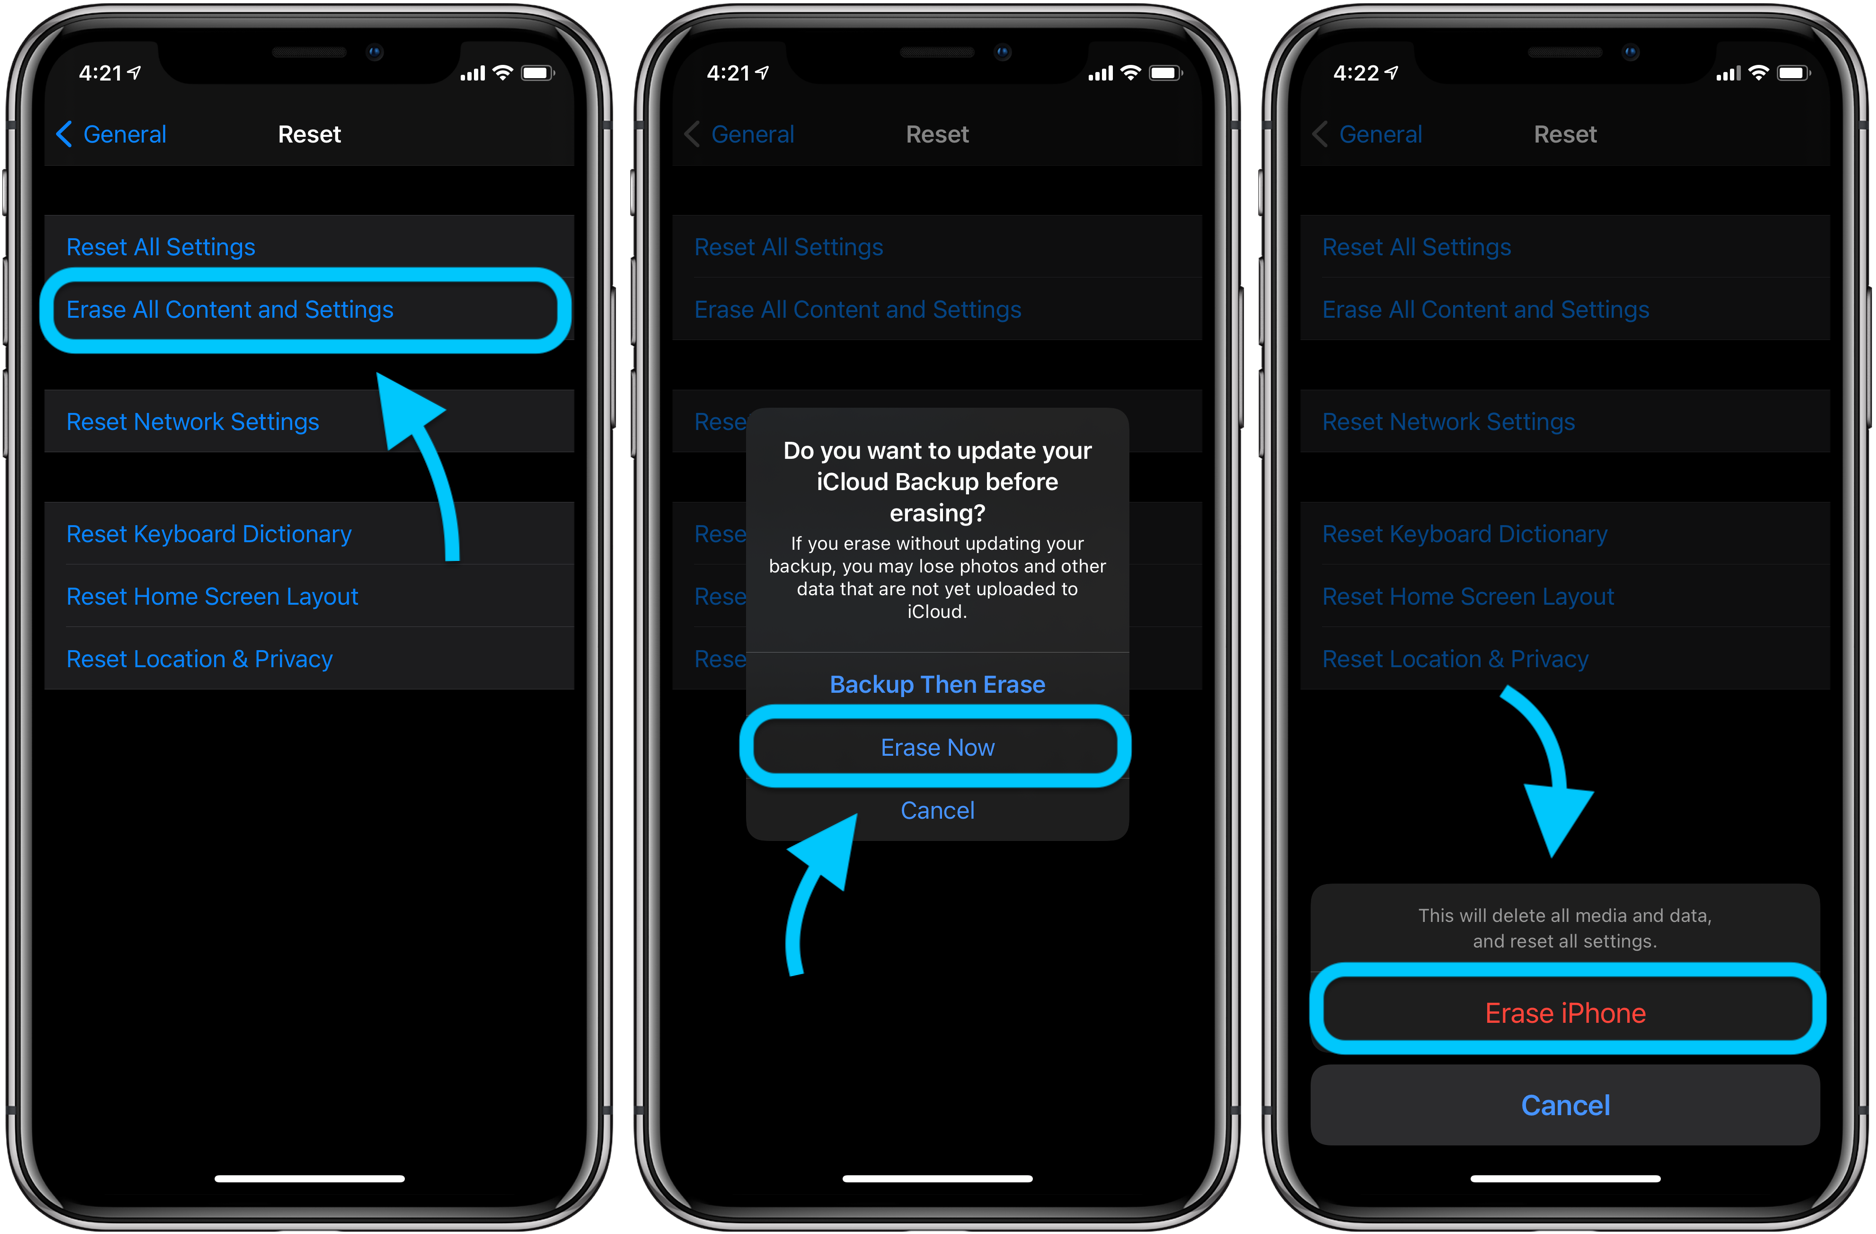 How to factory reset iPhone walkthrough 2